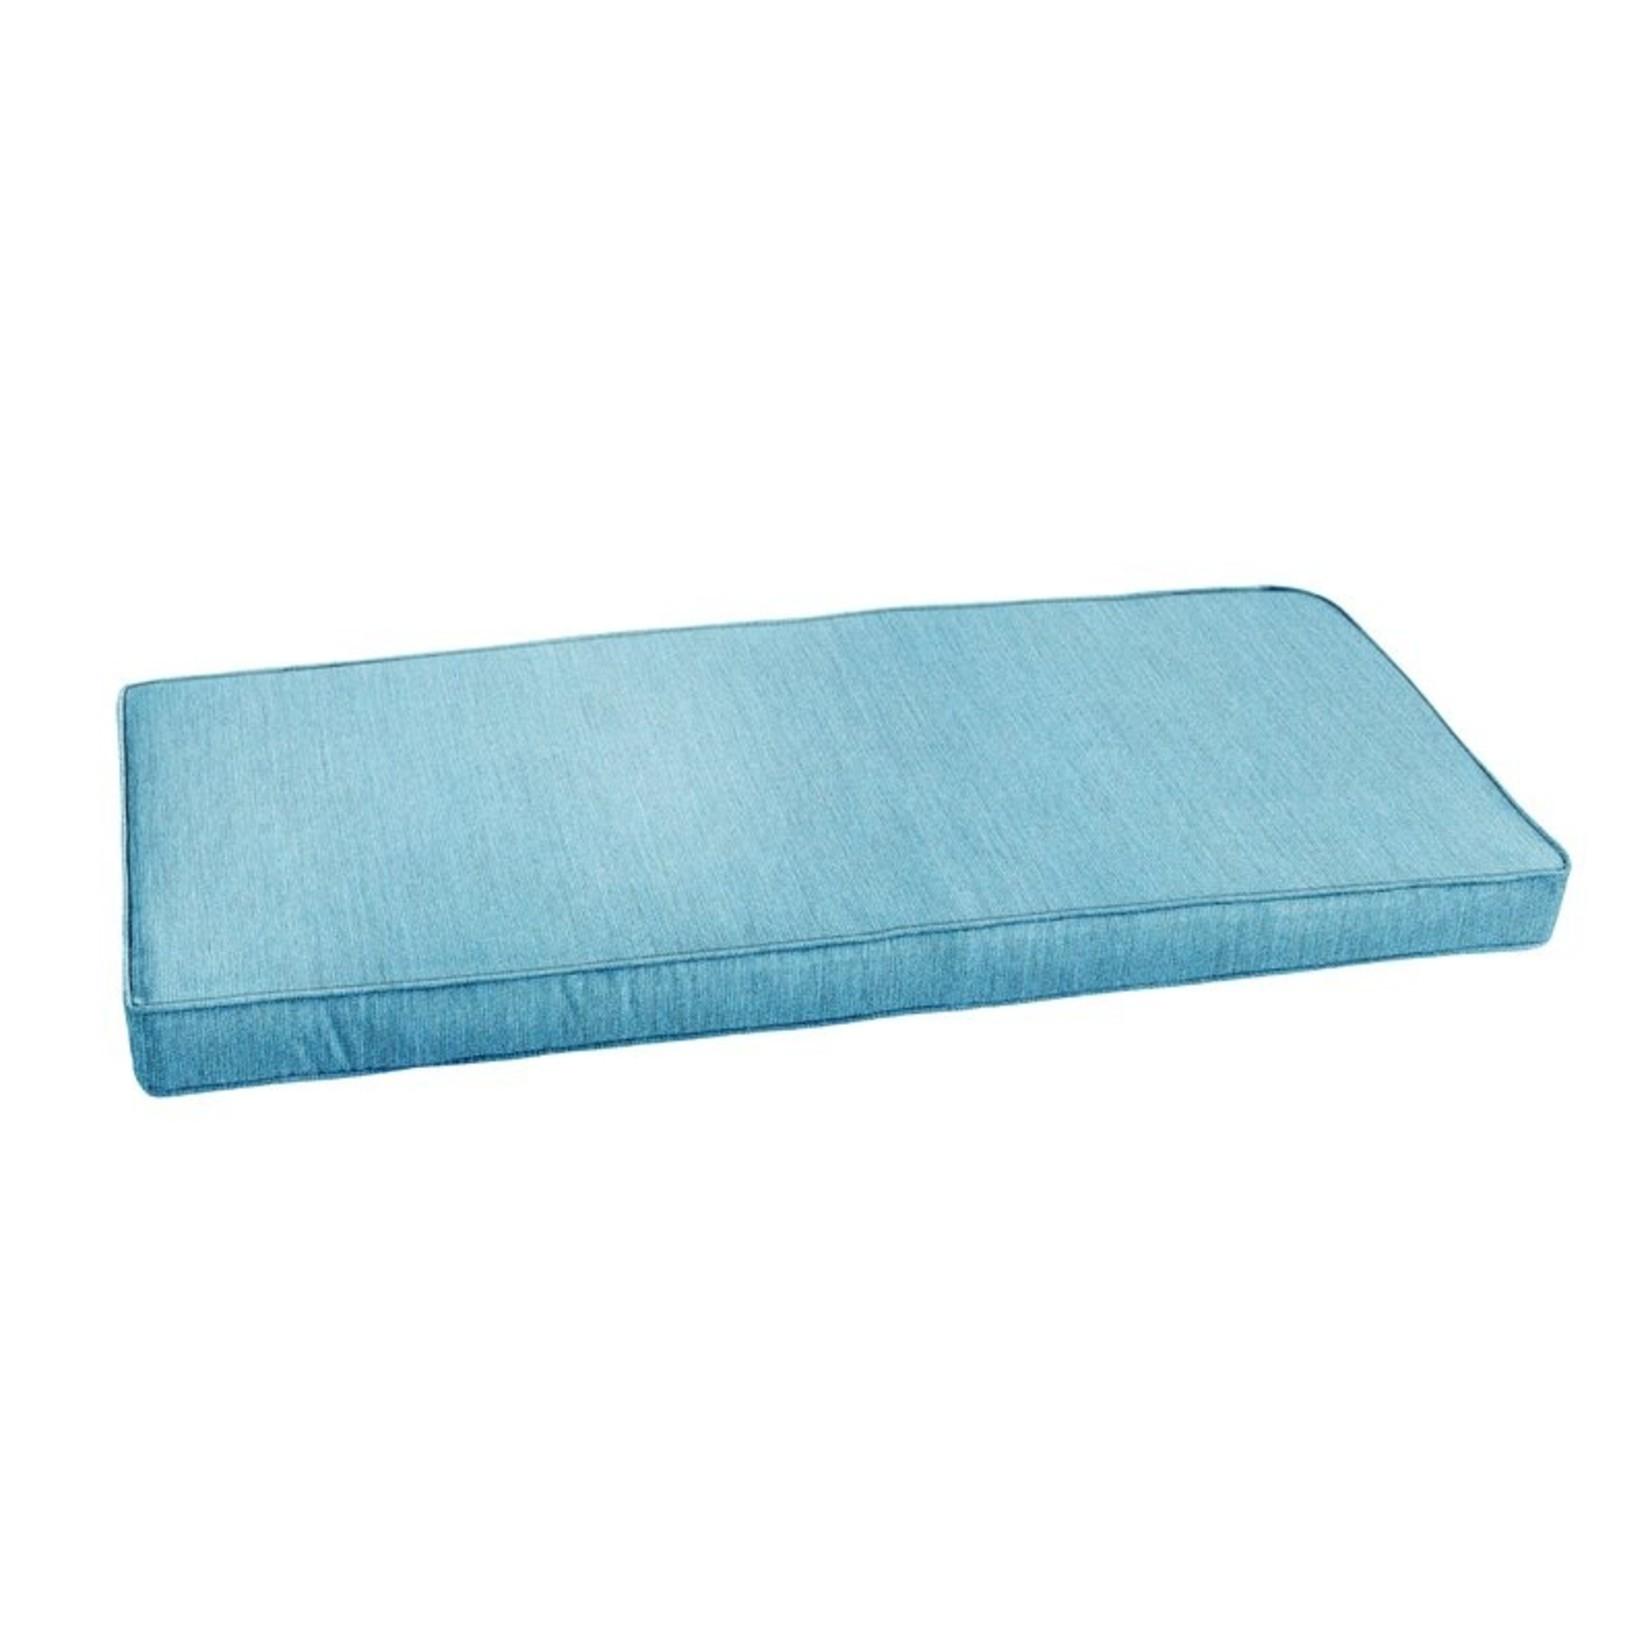 *Horizon Indoor/Outdoor Sunbrella Bench Cushion - Blue